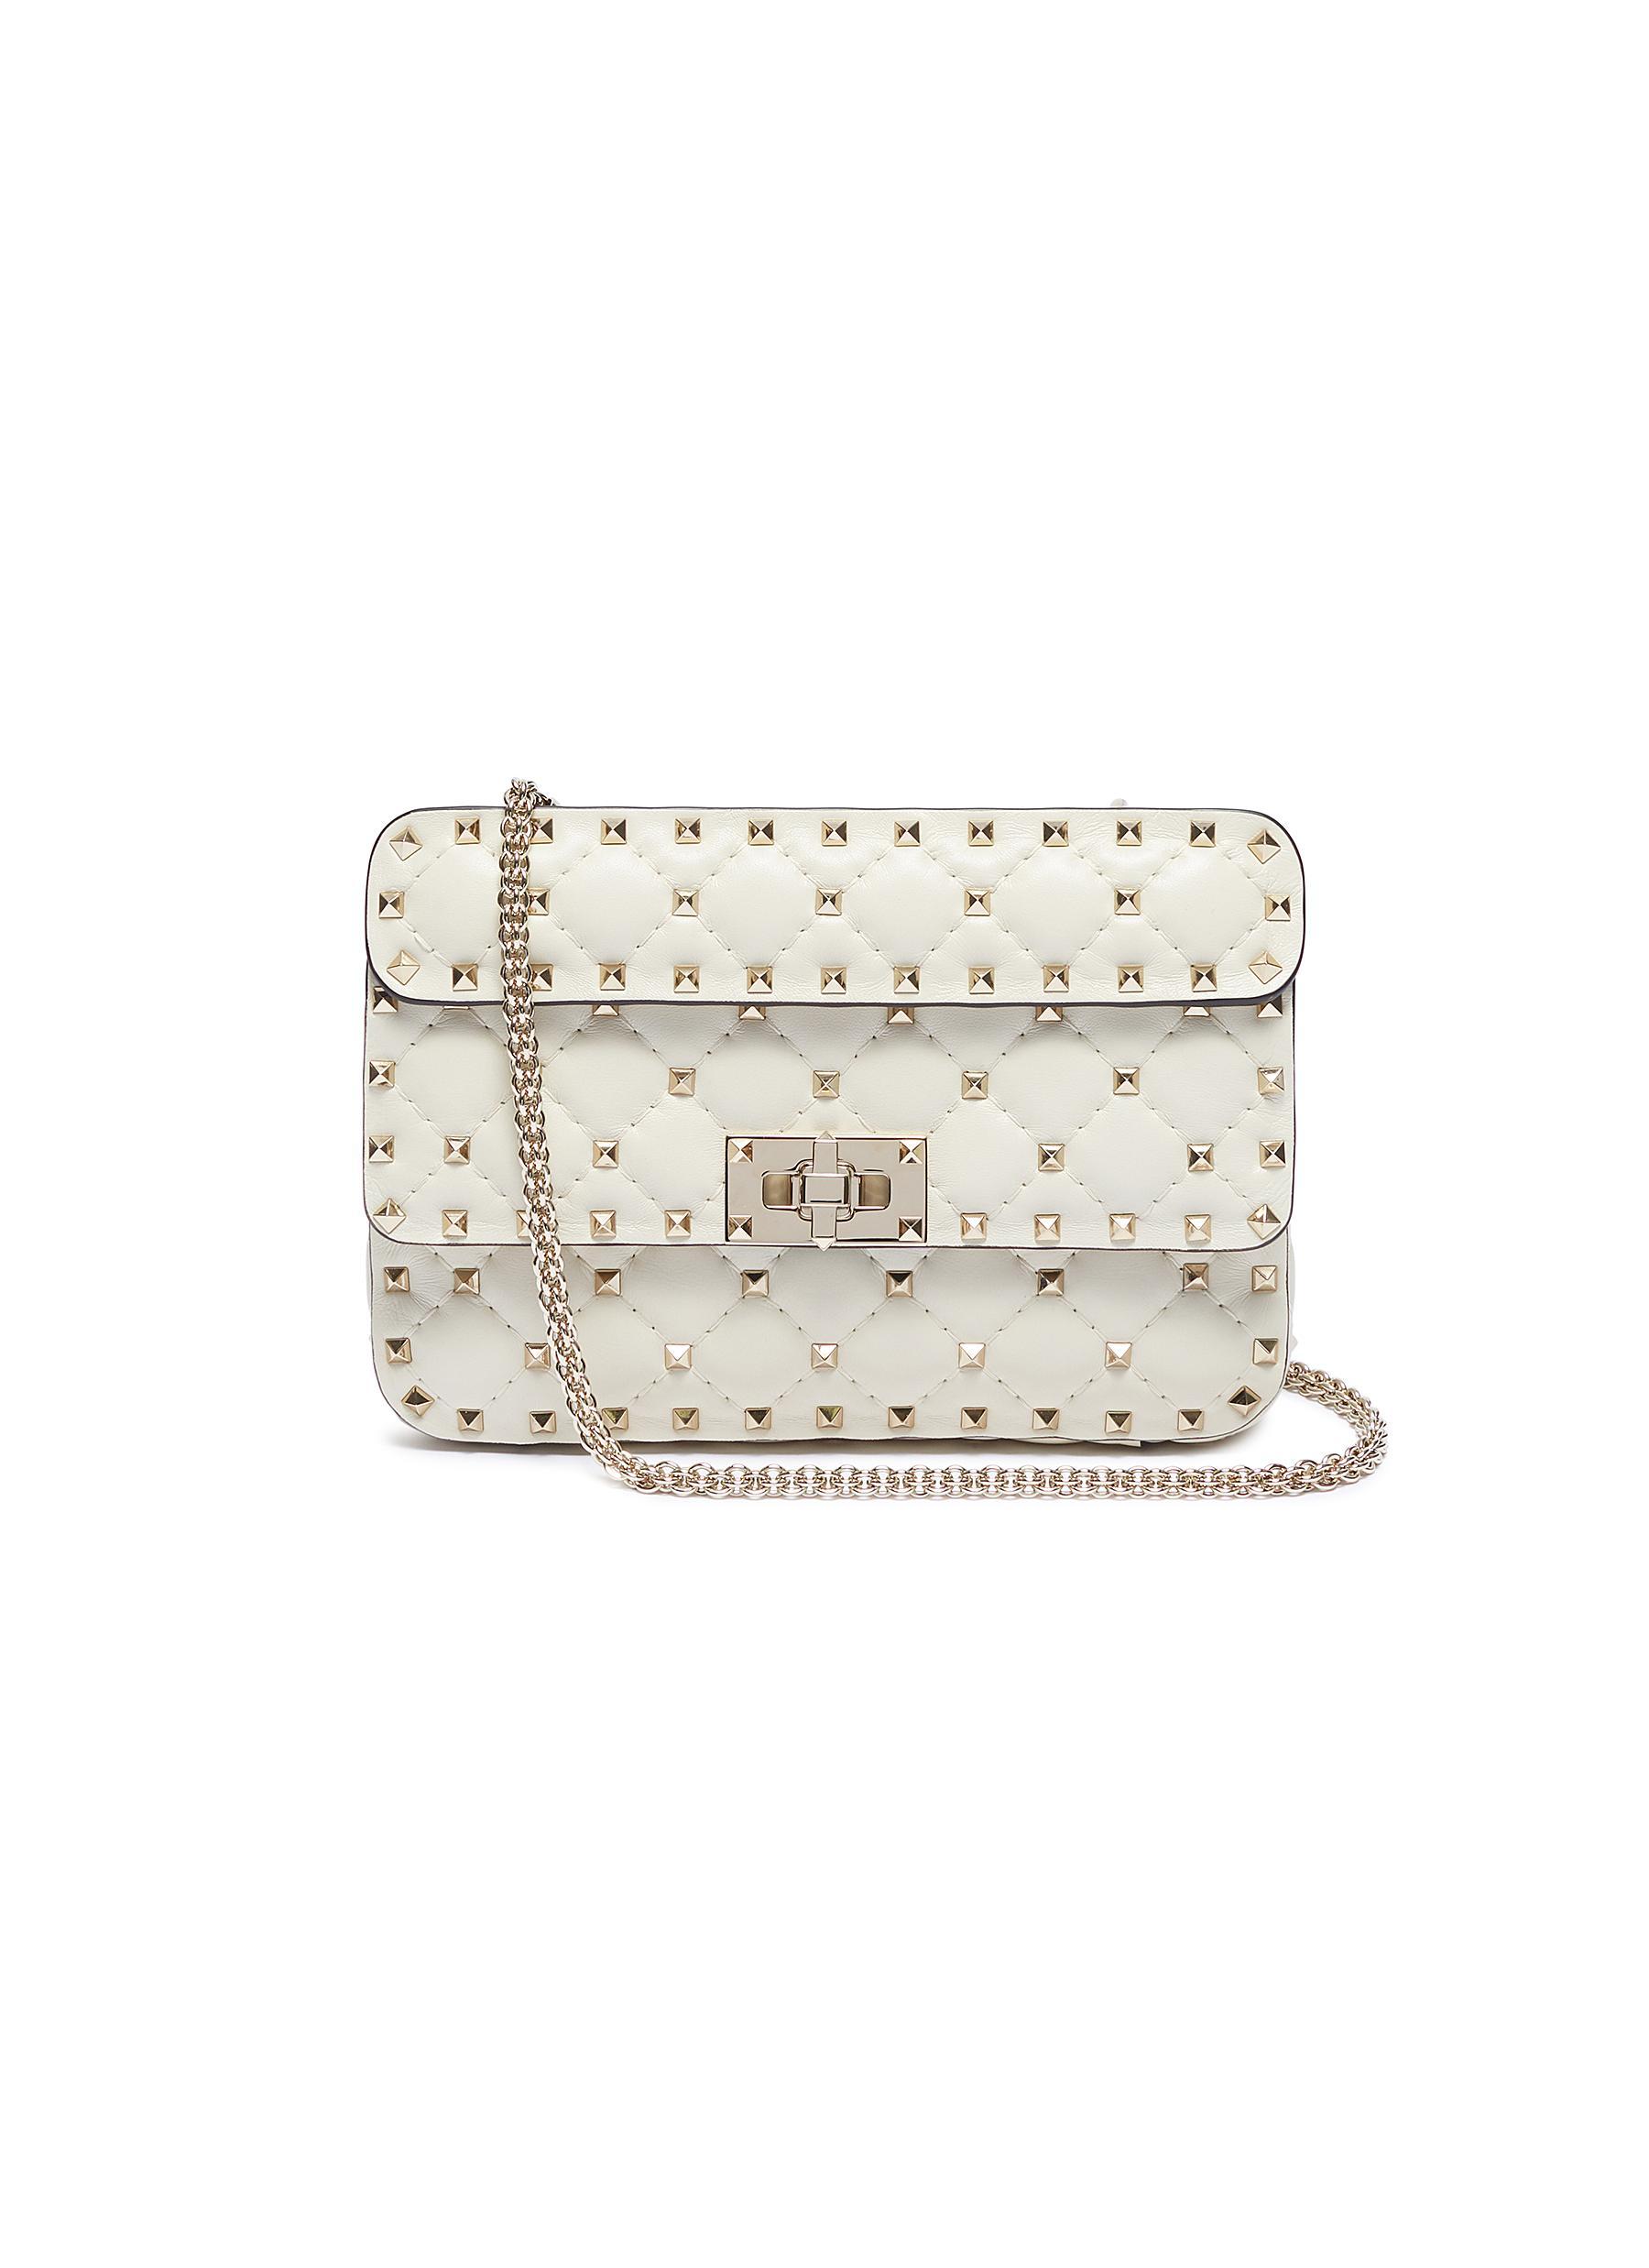 Valentino 'Rockstud Spike' Small Leather Shoulder Bag In Light Ivory